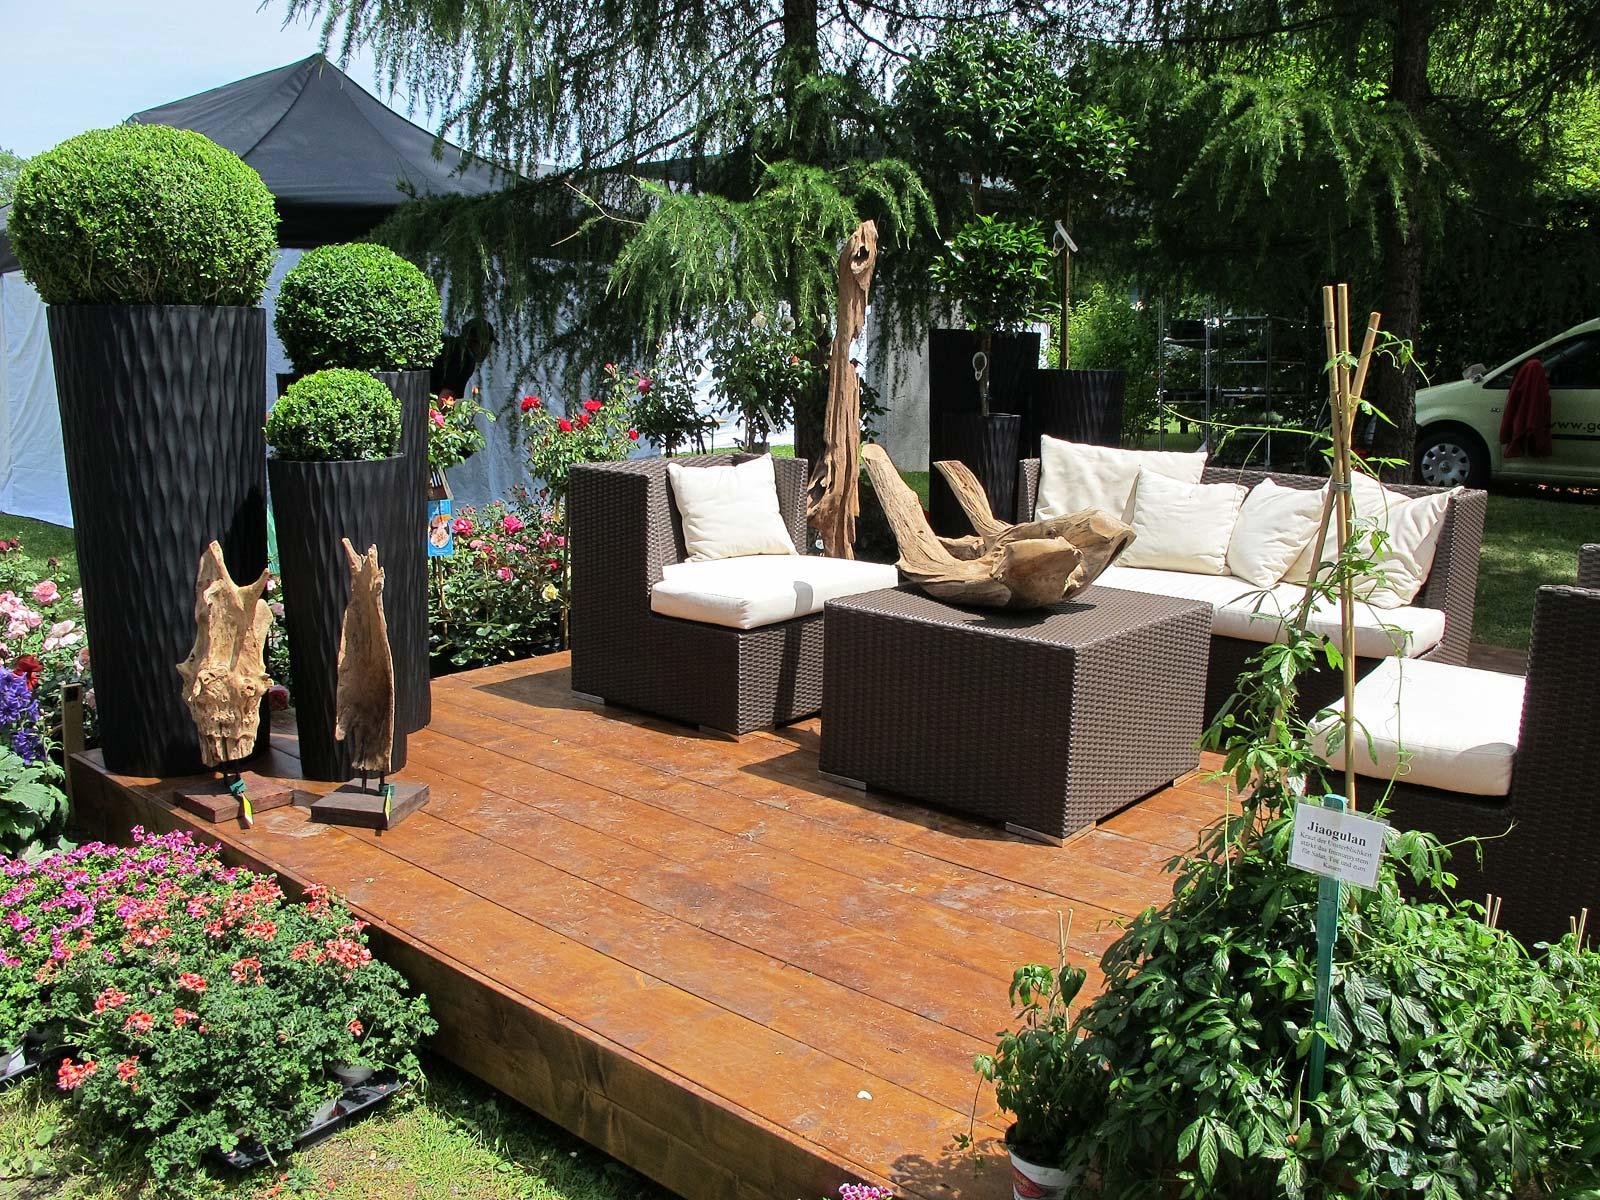 werners baumschule und g rtnerei. Black Bedroom Furniture Sets. Home Design Ideas